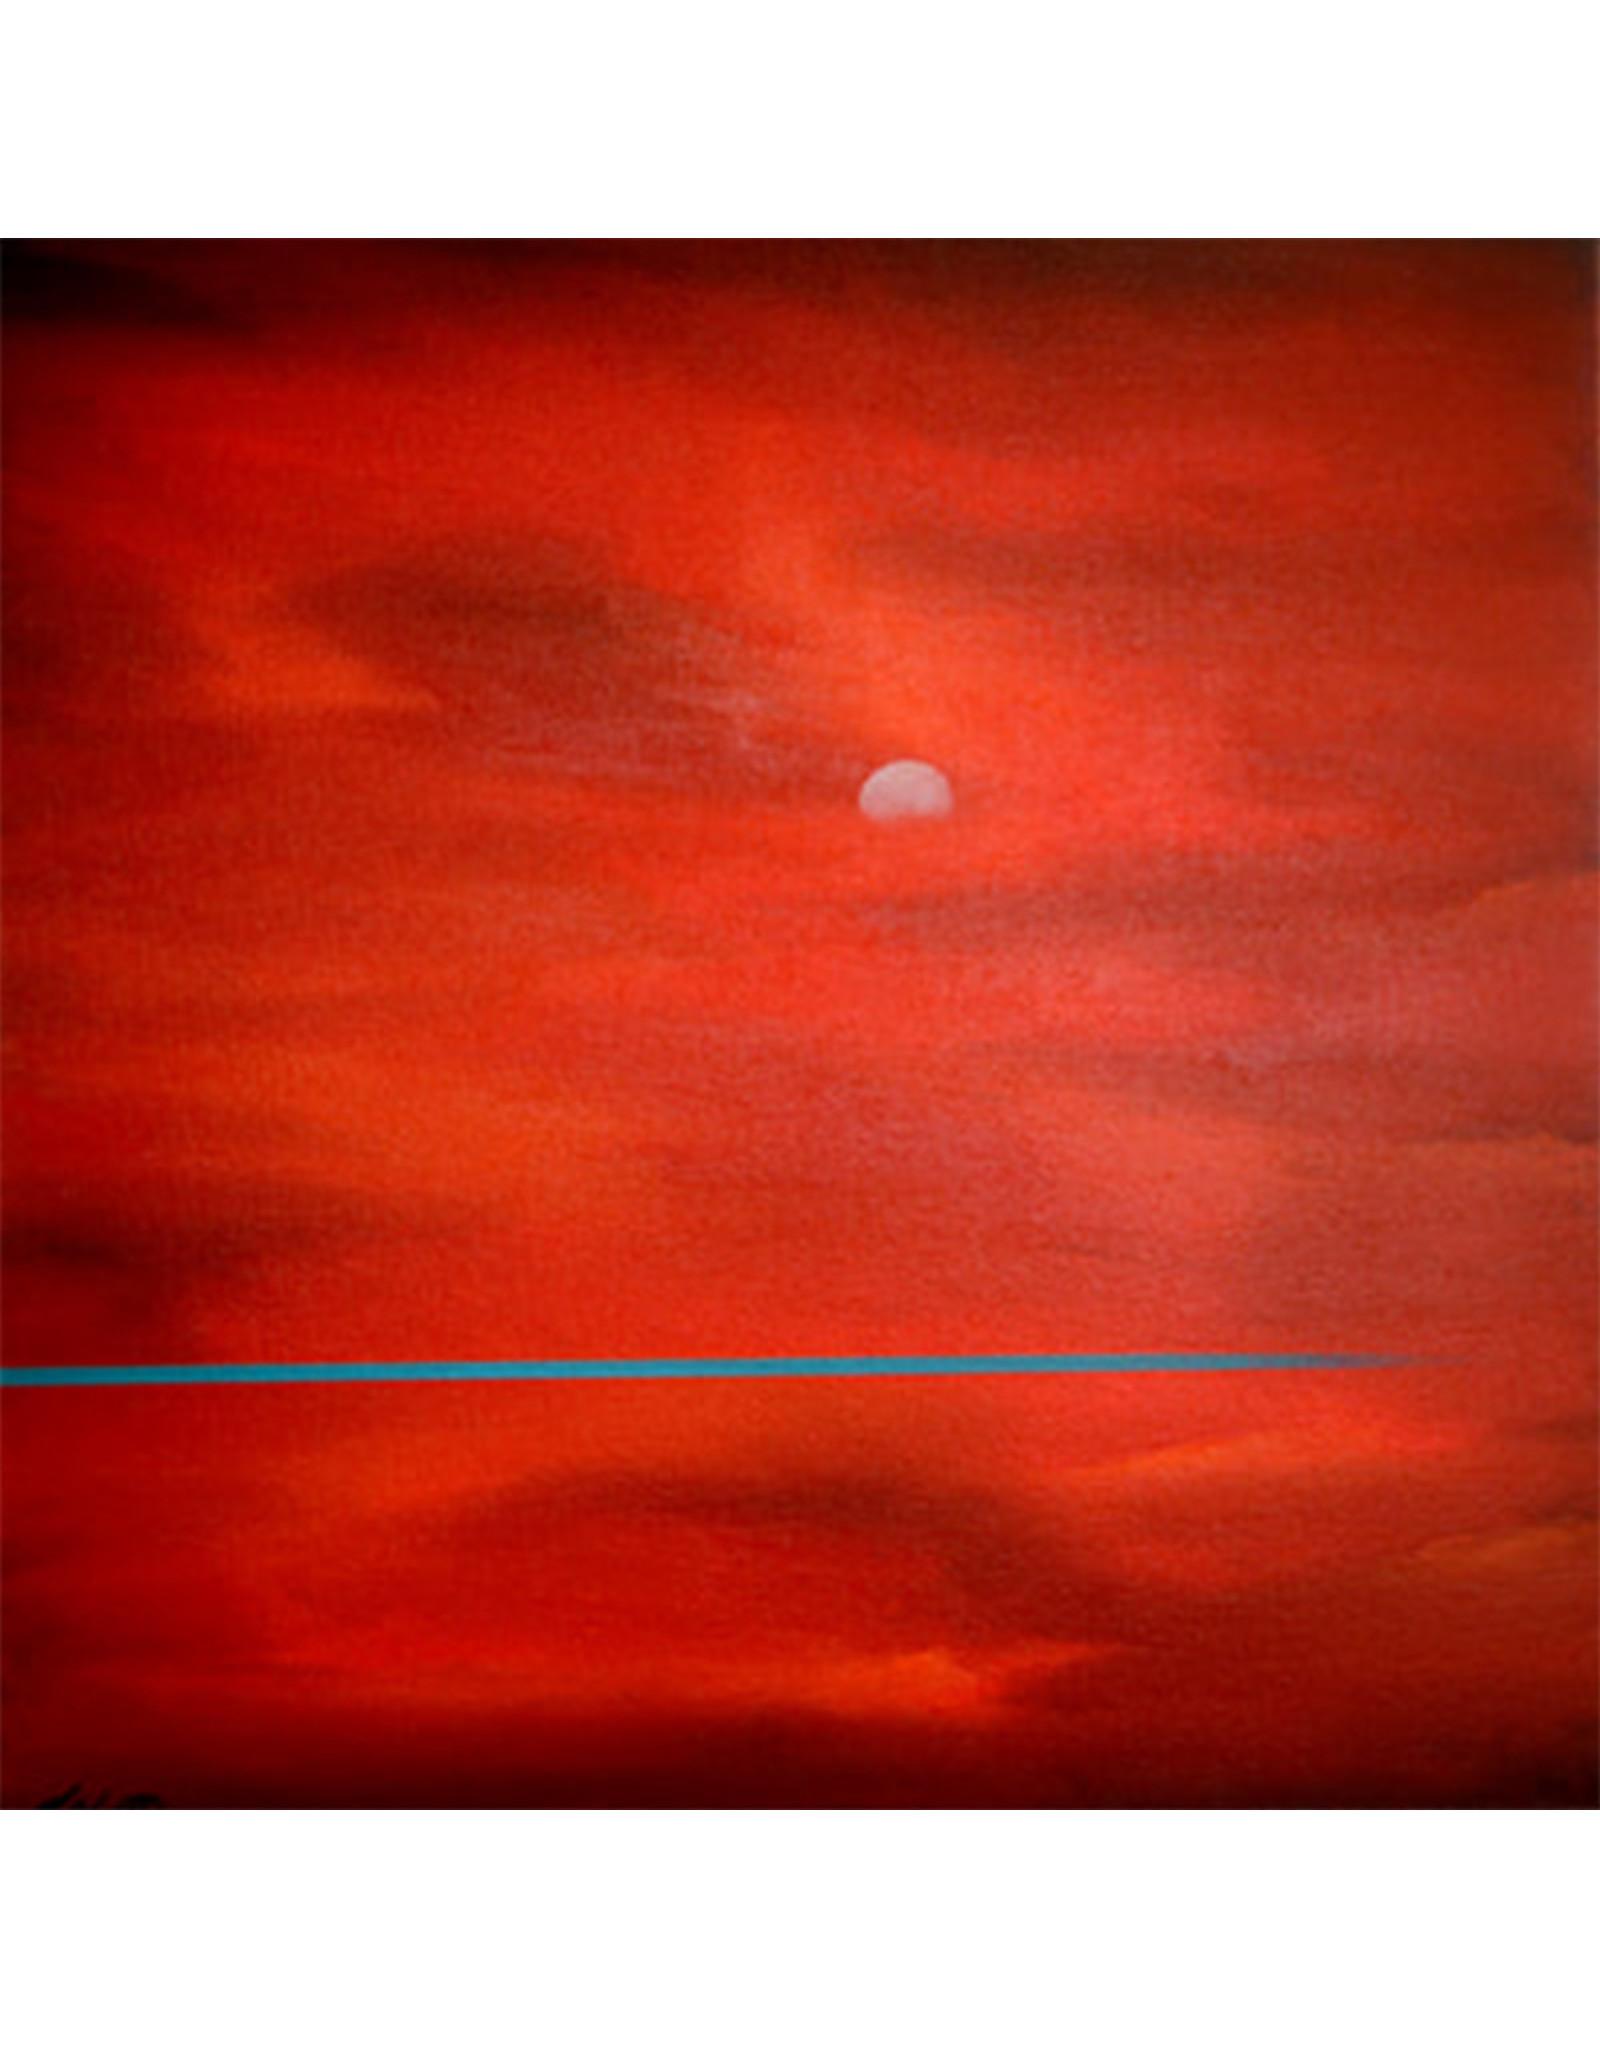 Ed Wyatt Blue Infinity - Acrylic / Oil on Canvas - Ed Wyatt